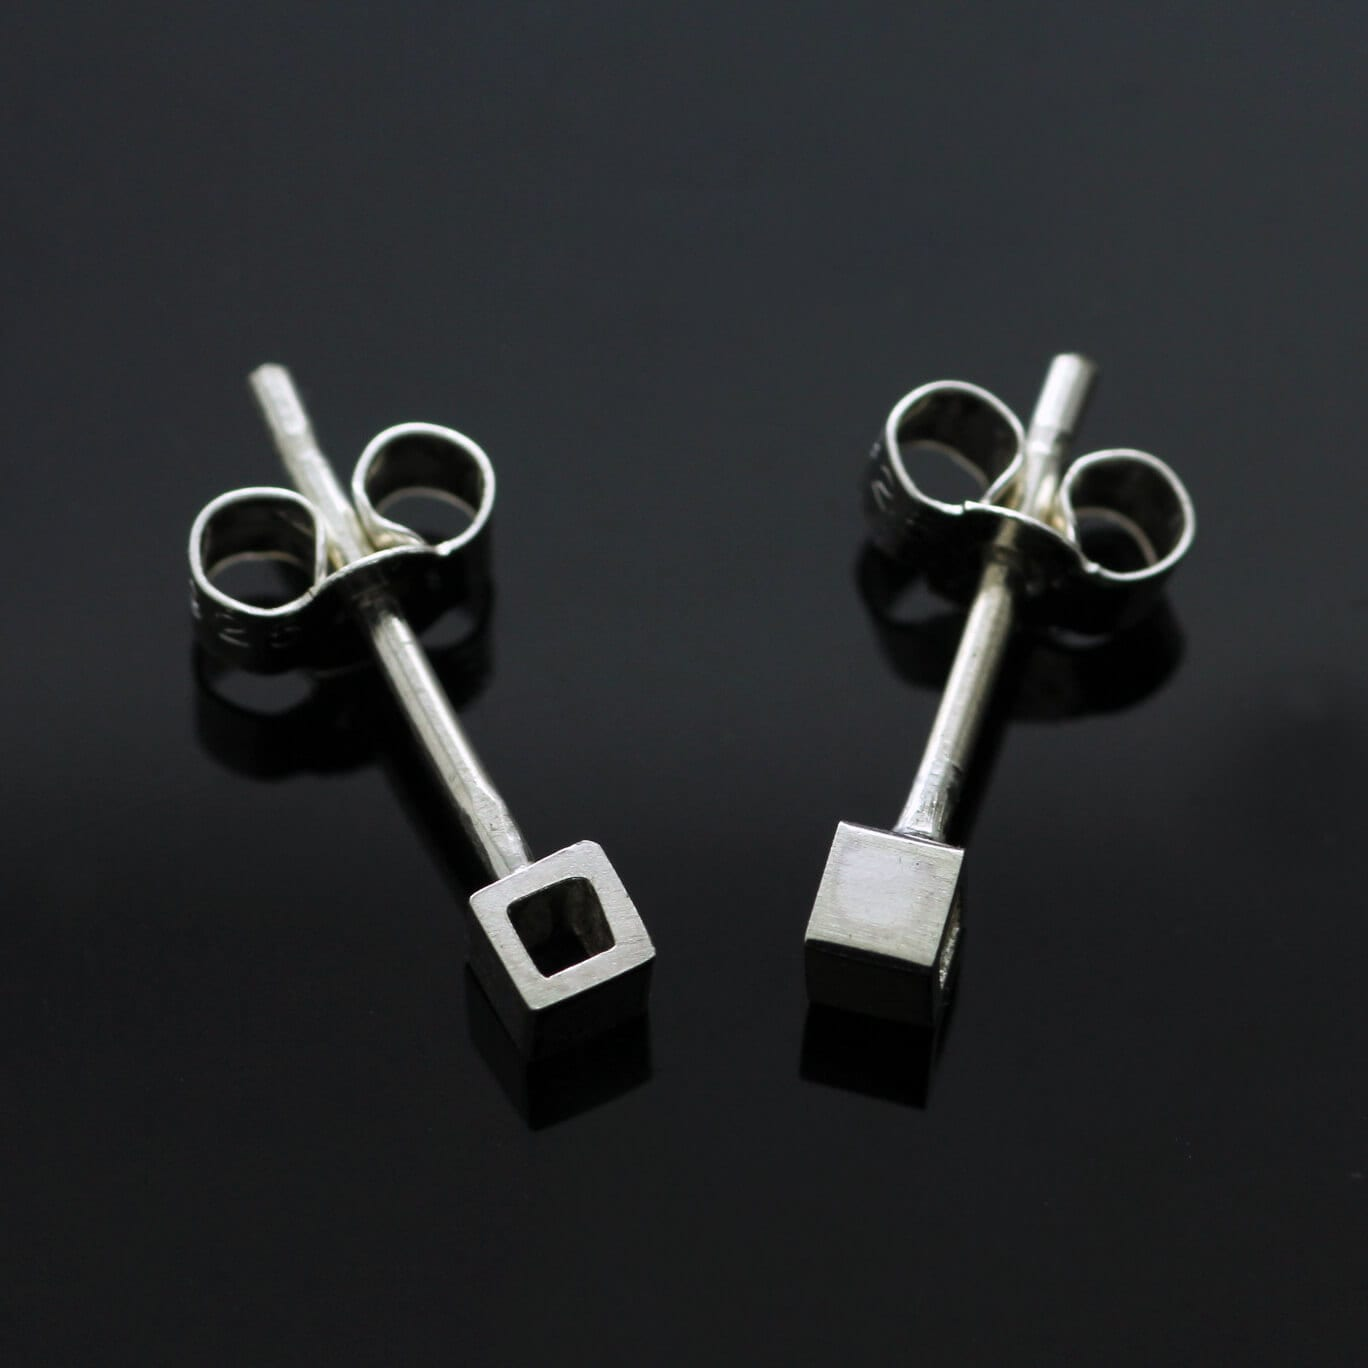 Modern handmade geometric silver Cube stud earrings